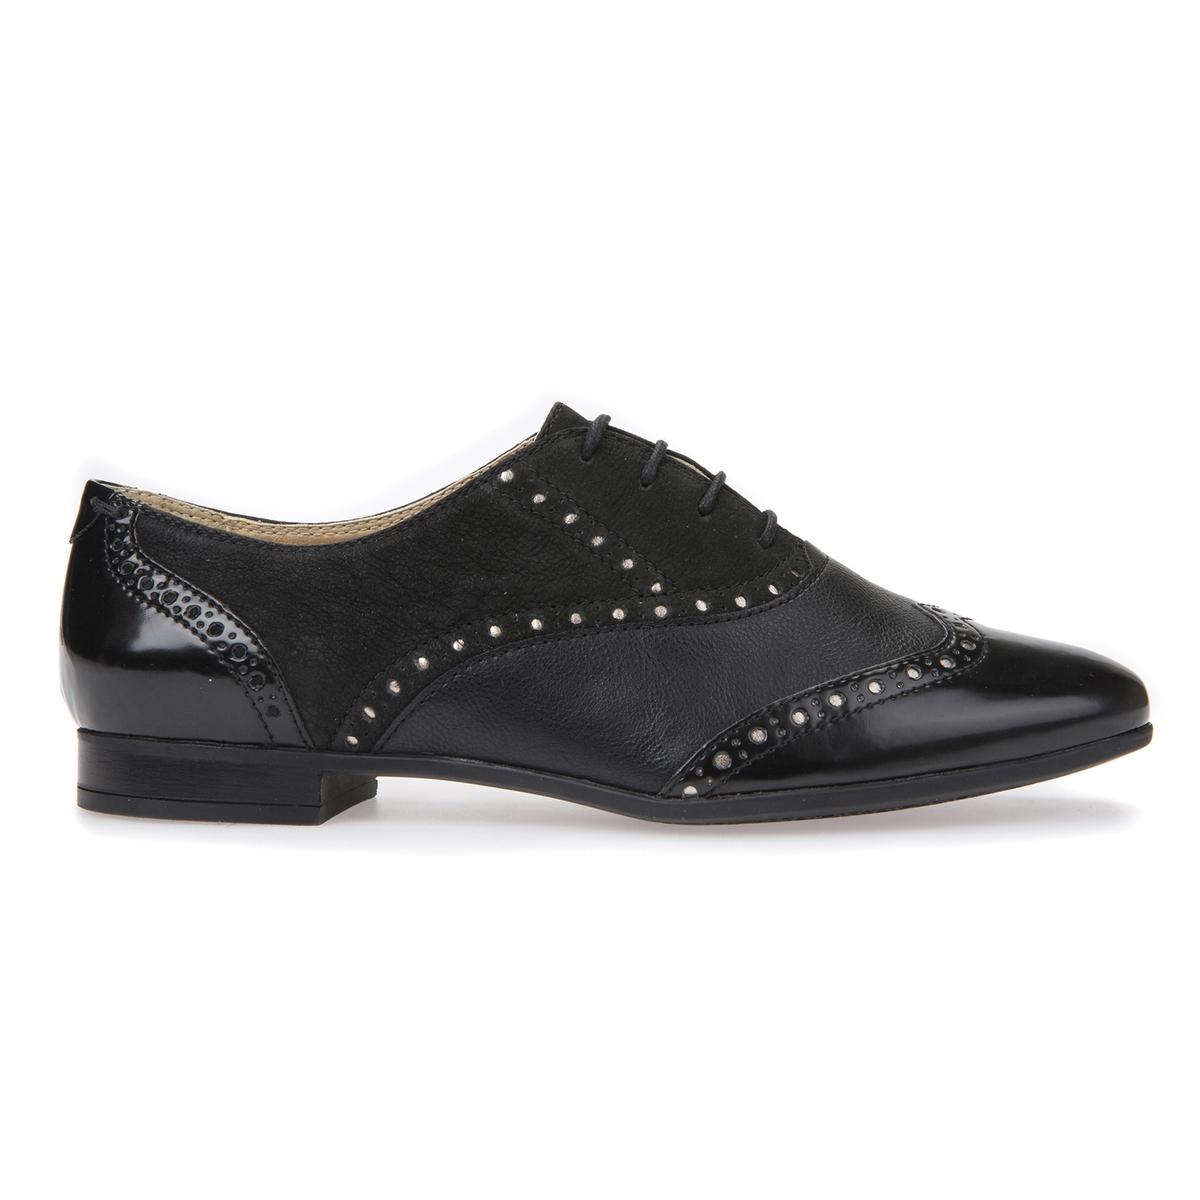 Ботинки-дерби из кожи D MARLYNA C ботинки дерби d janalee a